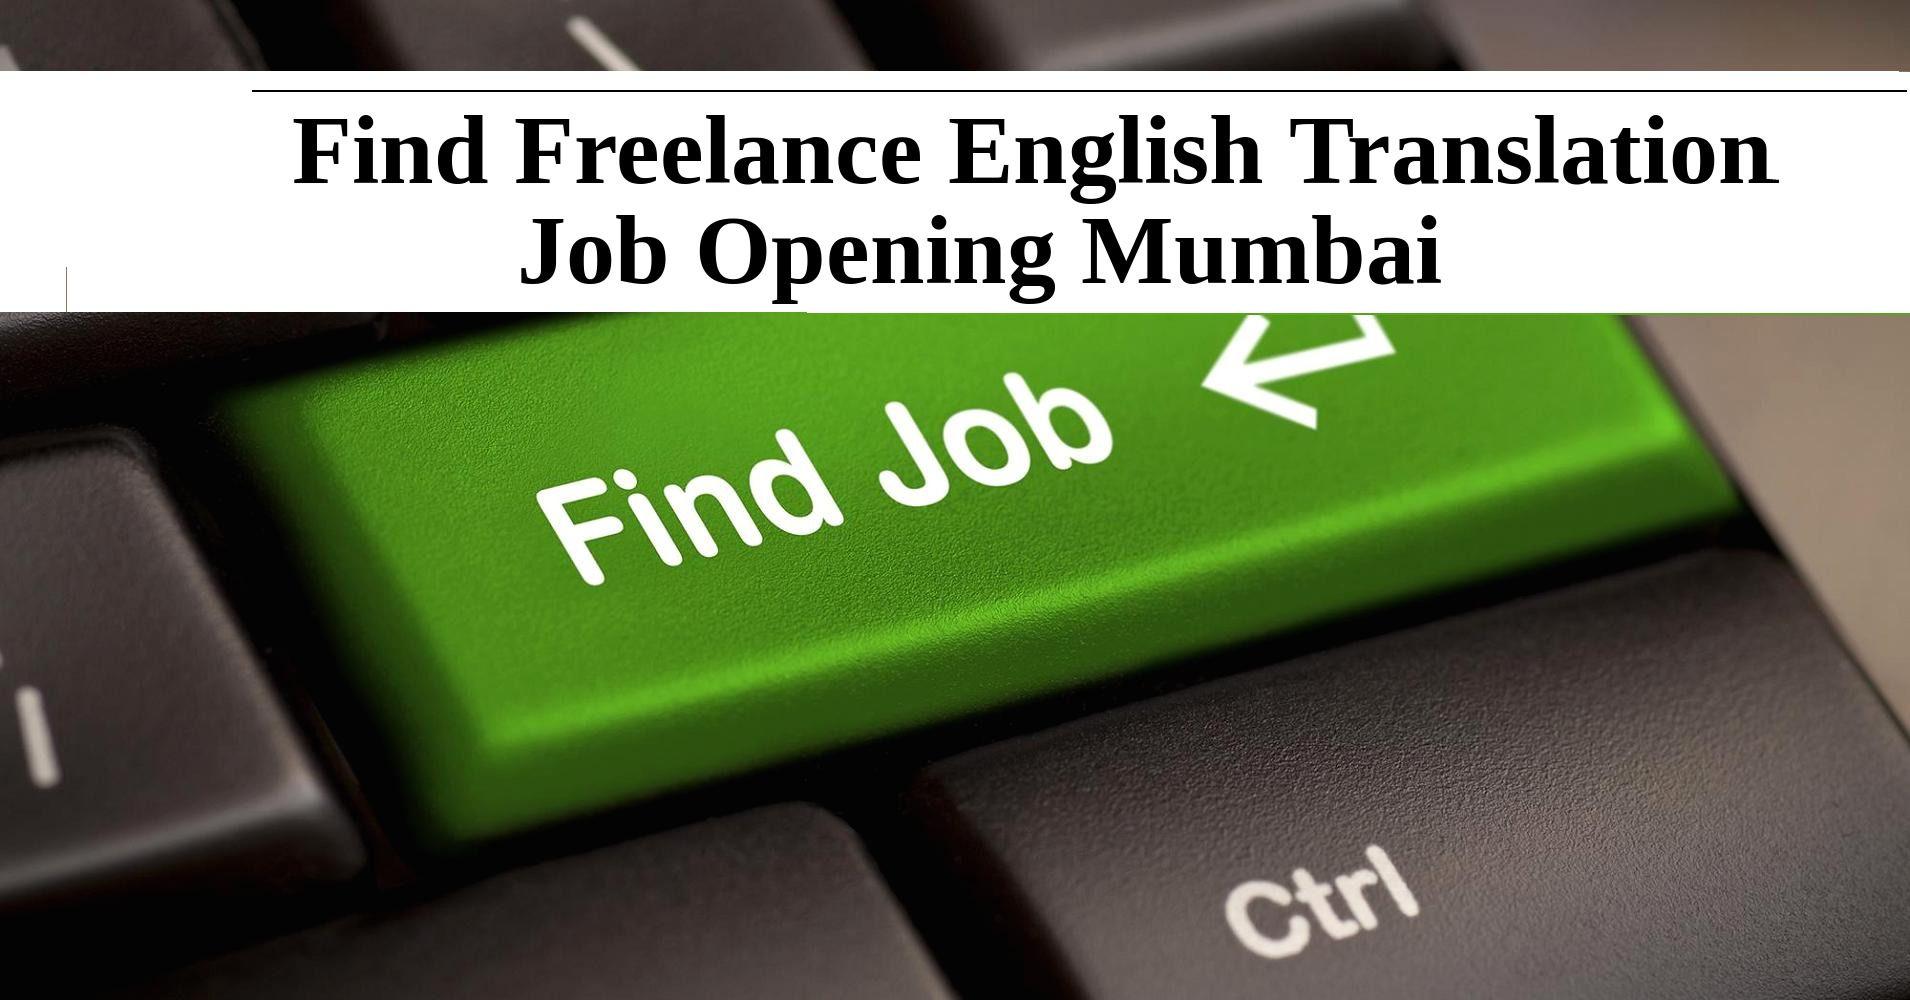 Freelance English Transcription Jobs in Delhi India Noida